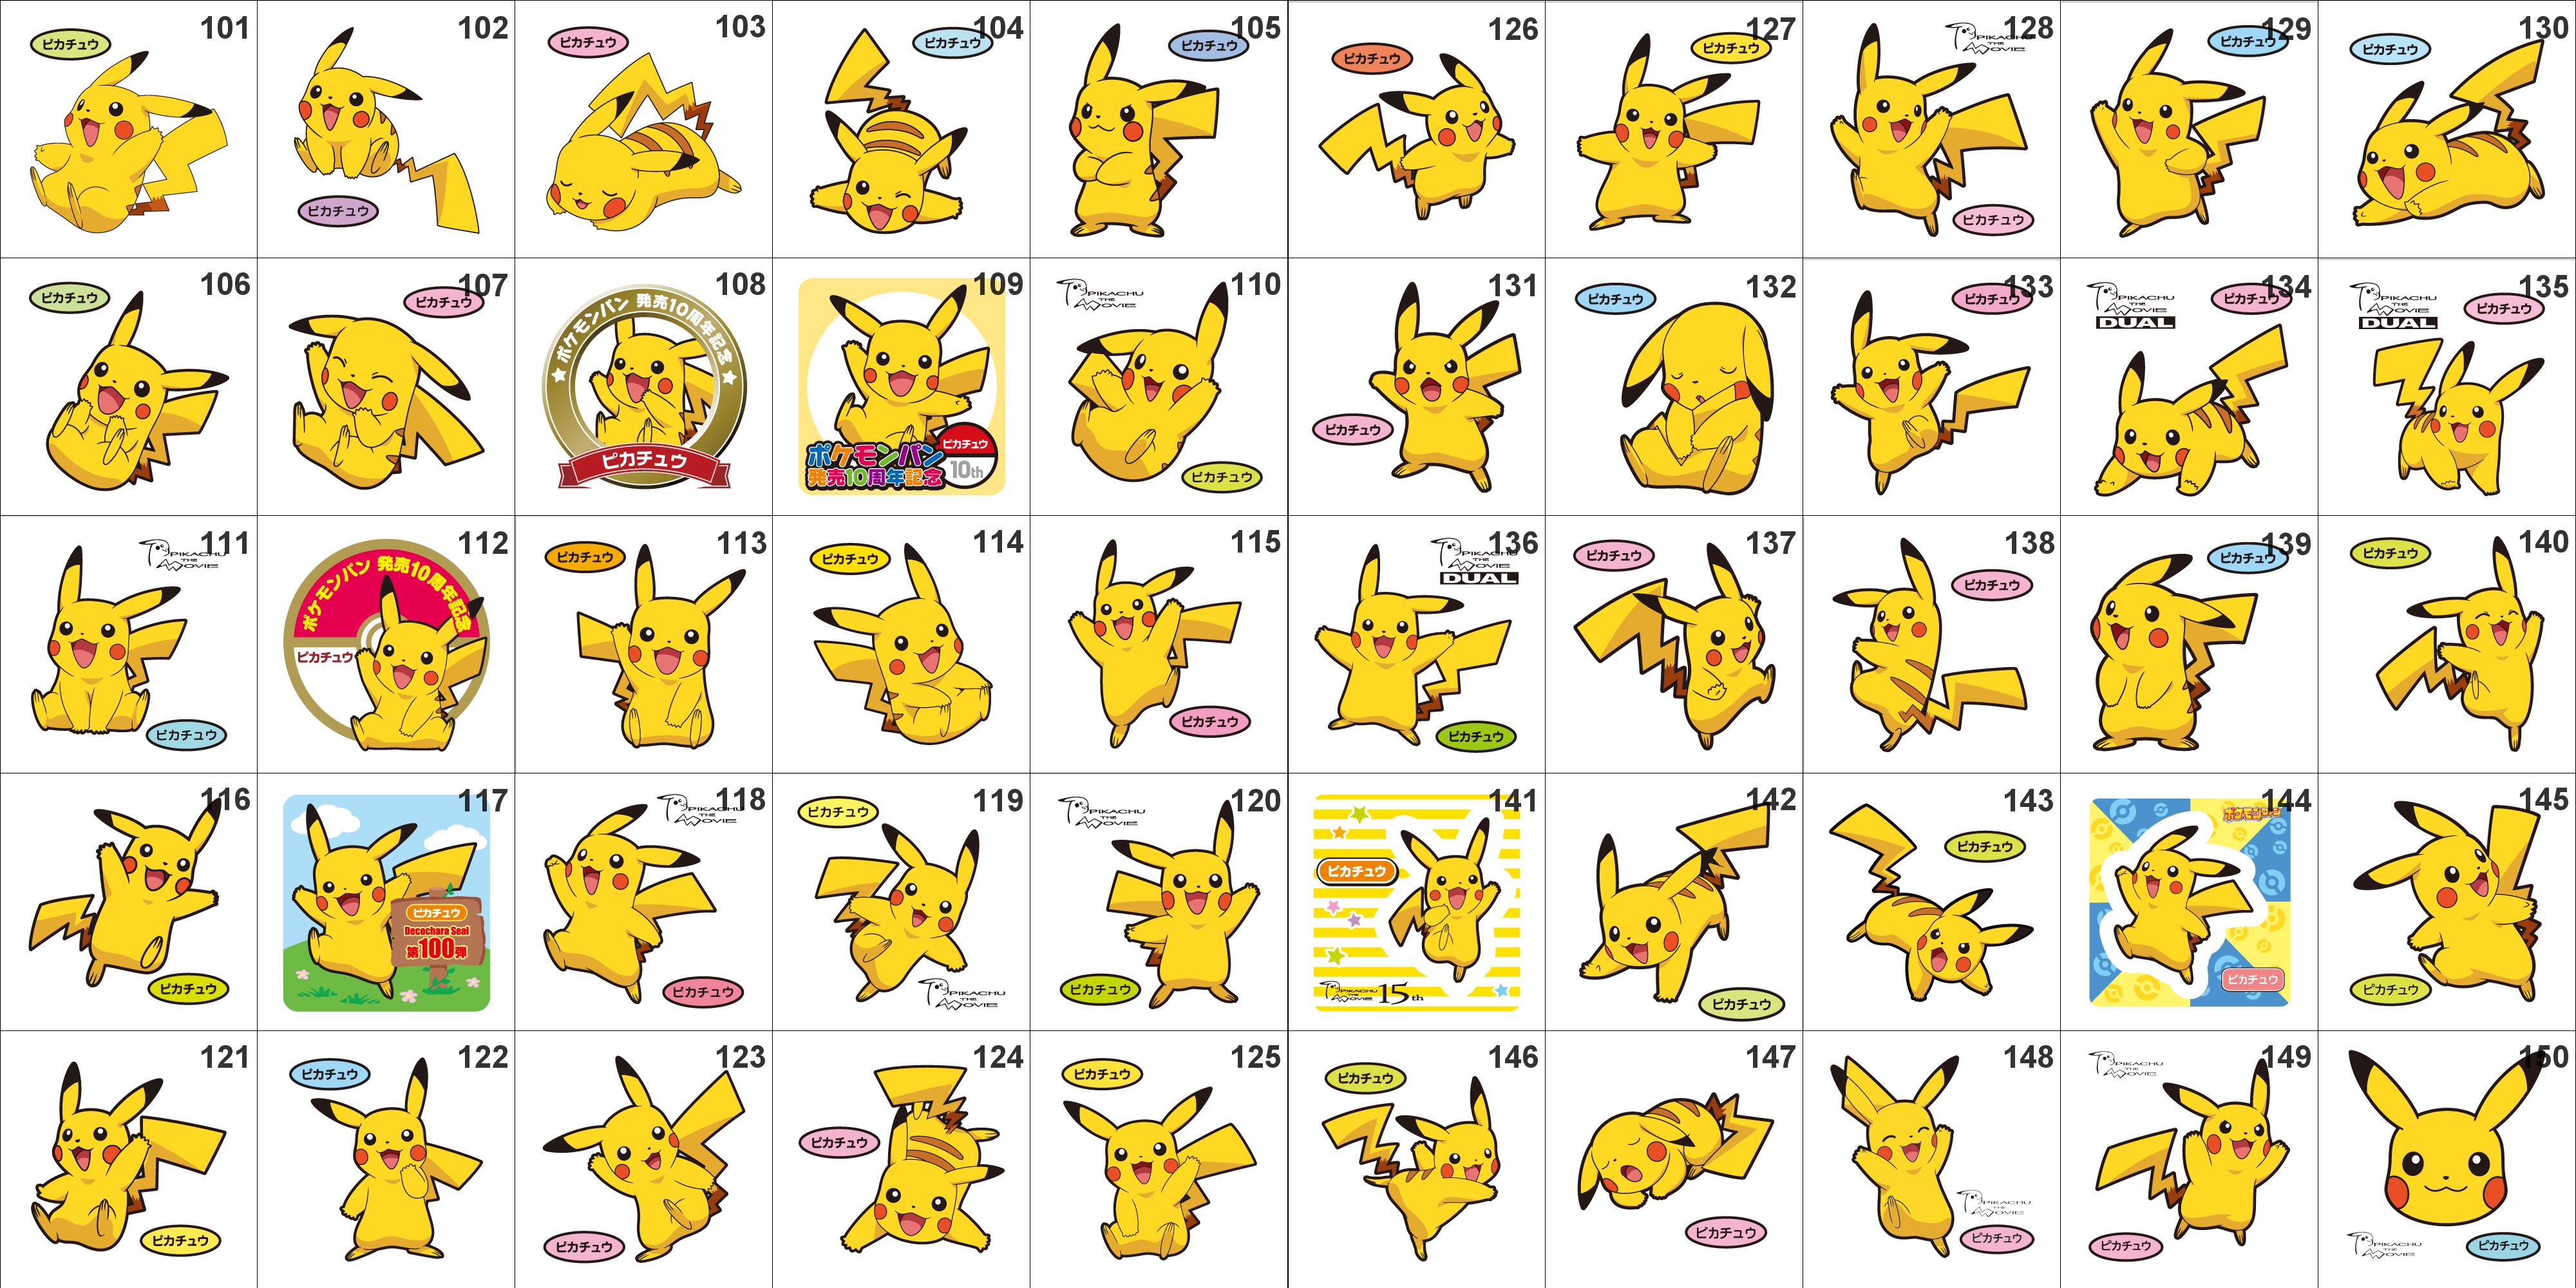 025 Pikachu Pan Stickers Pokemon 183 Splash S Pokemon Pan Stickers 183 Online Store Powered By Storenvy